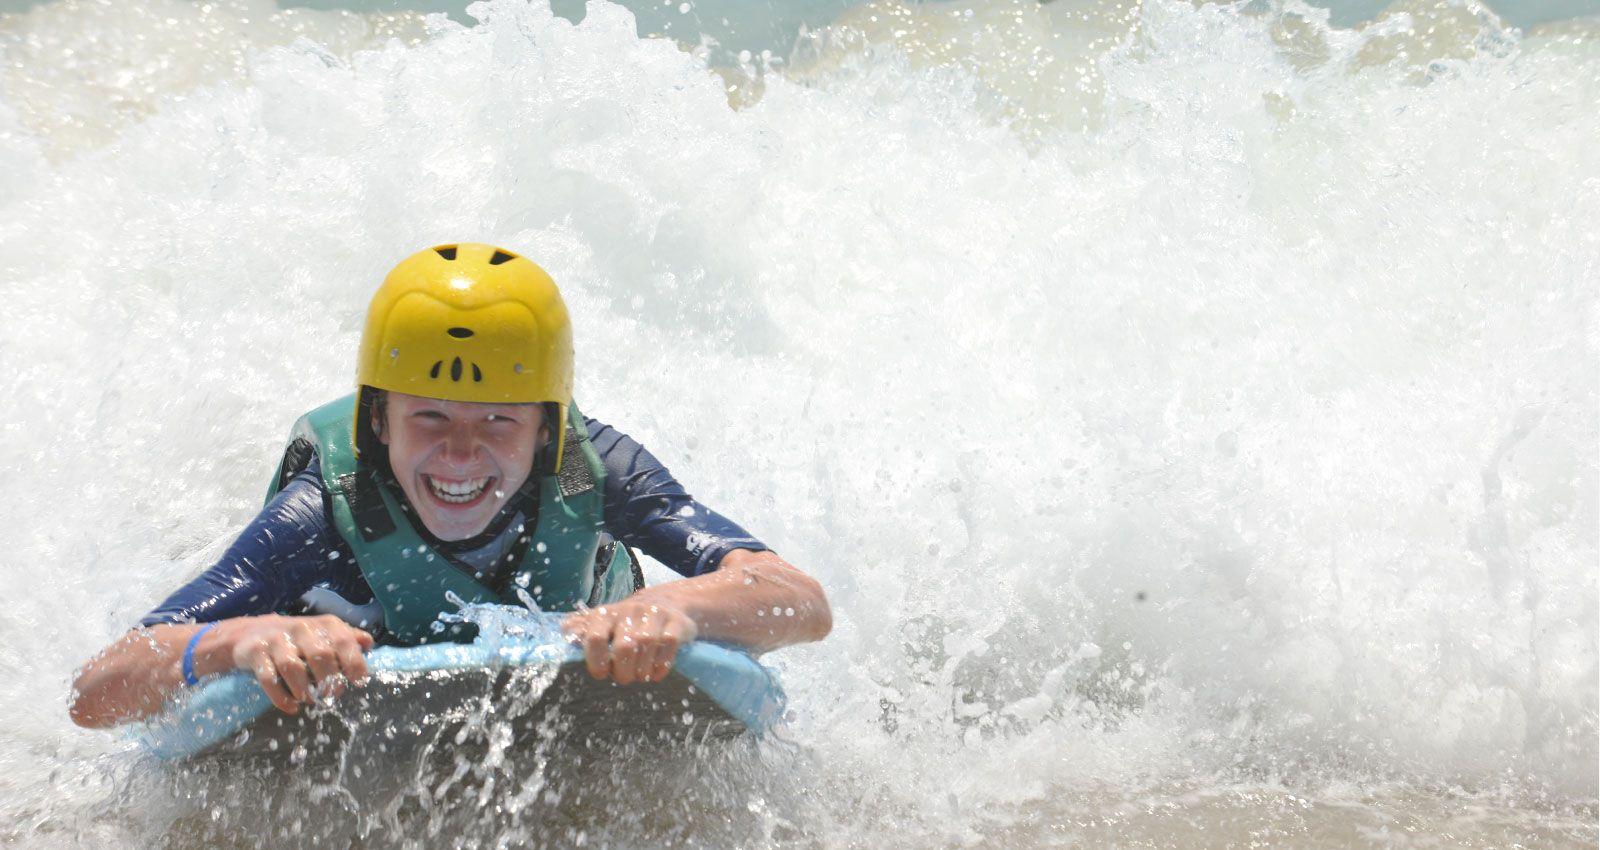 pgl adventure holidays specialist holidays two centre adventure